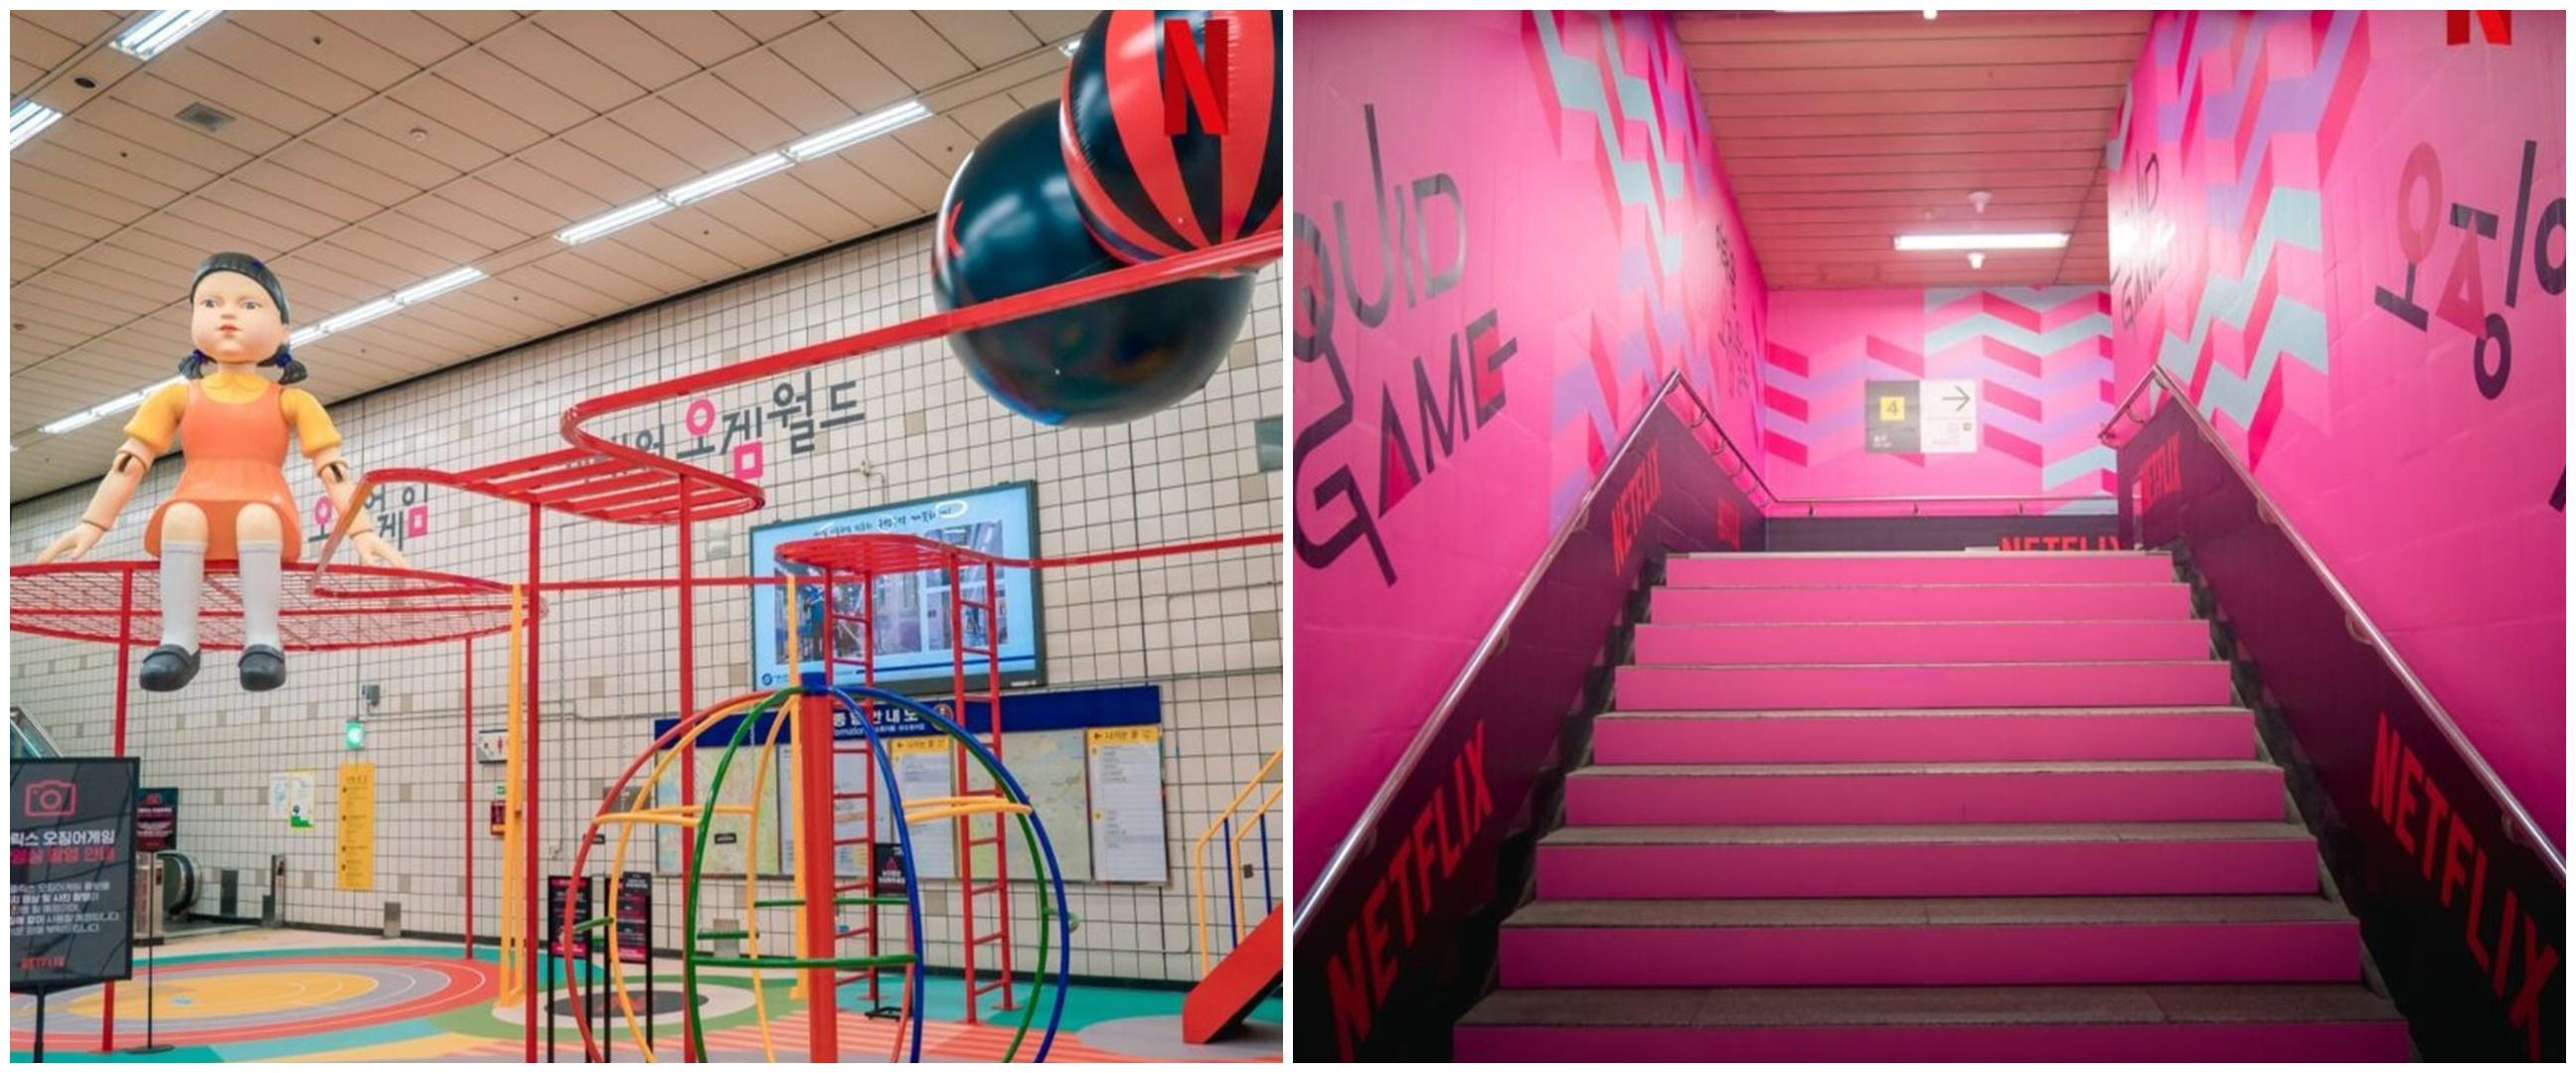 6 Penampakan pop-up playground Squid Game di Itaewon, sedot animo fans